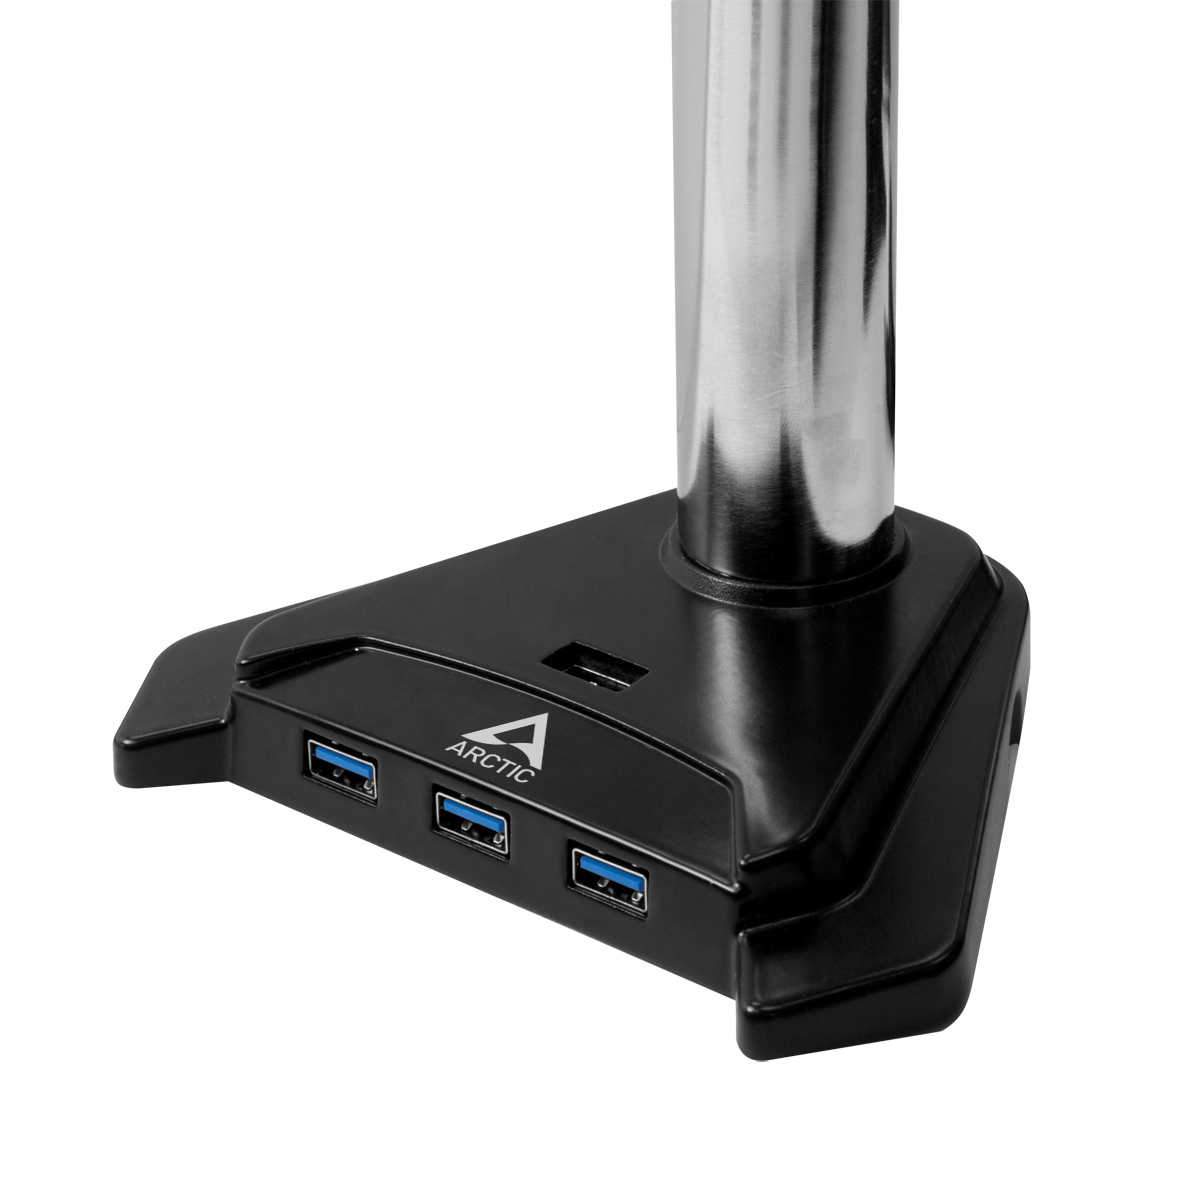 Suport Monitor ARCTIC Z1 Pro (Gen 2) negru, 13 - 43 inch, Hub 4 porturi USB 3.0